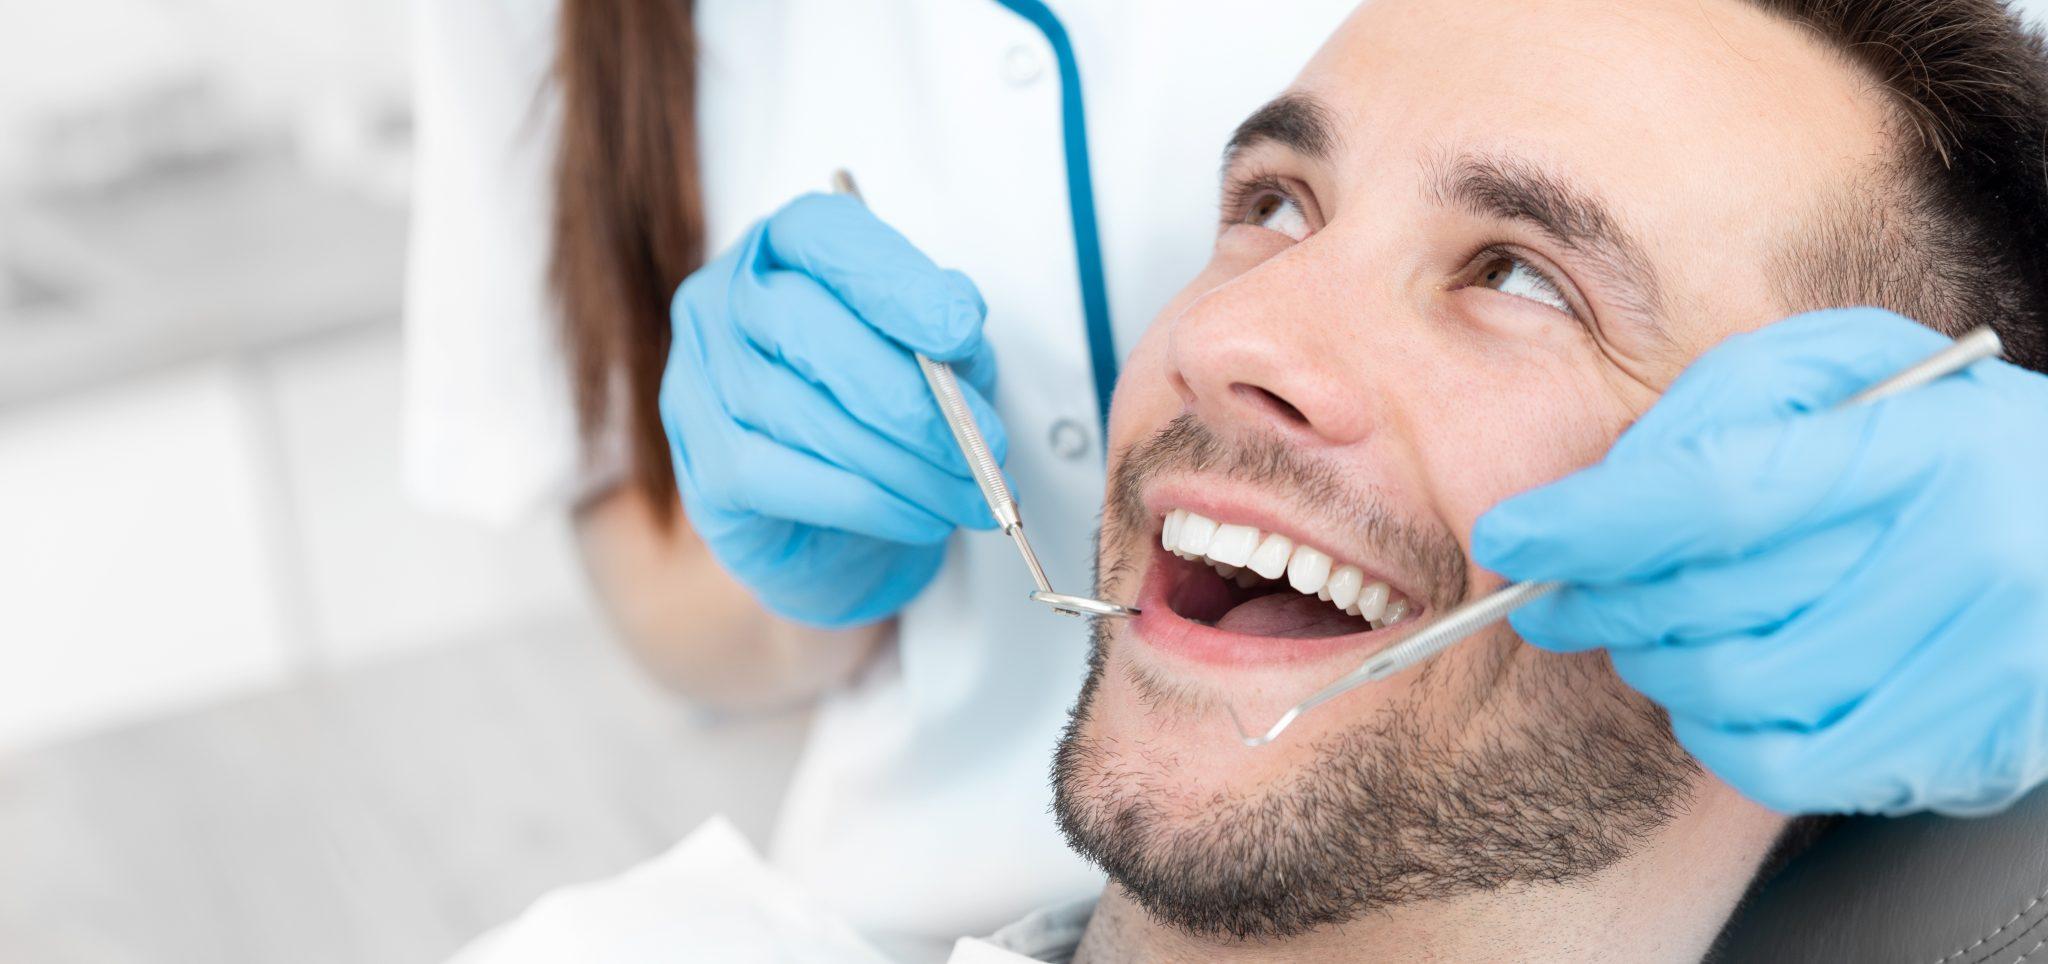 Young Man At The Dentist